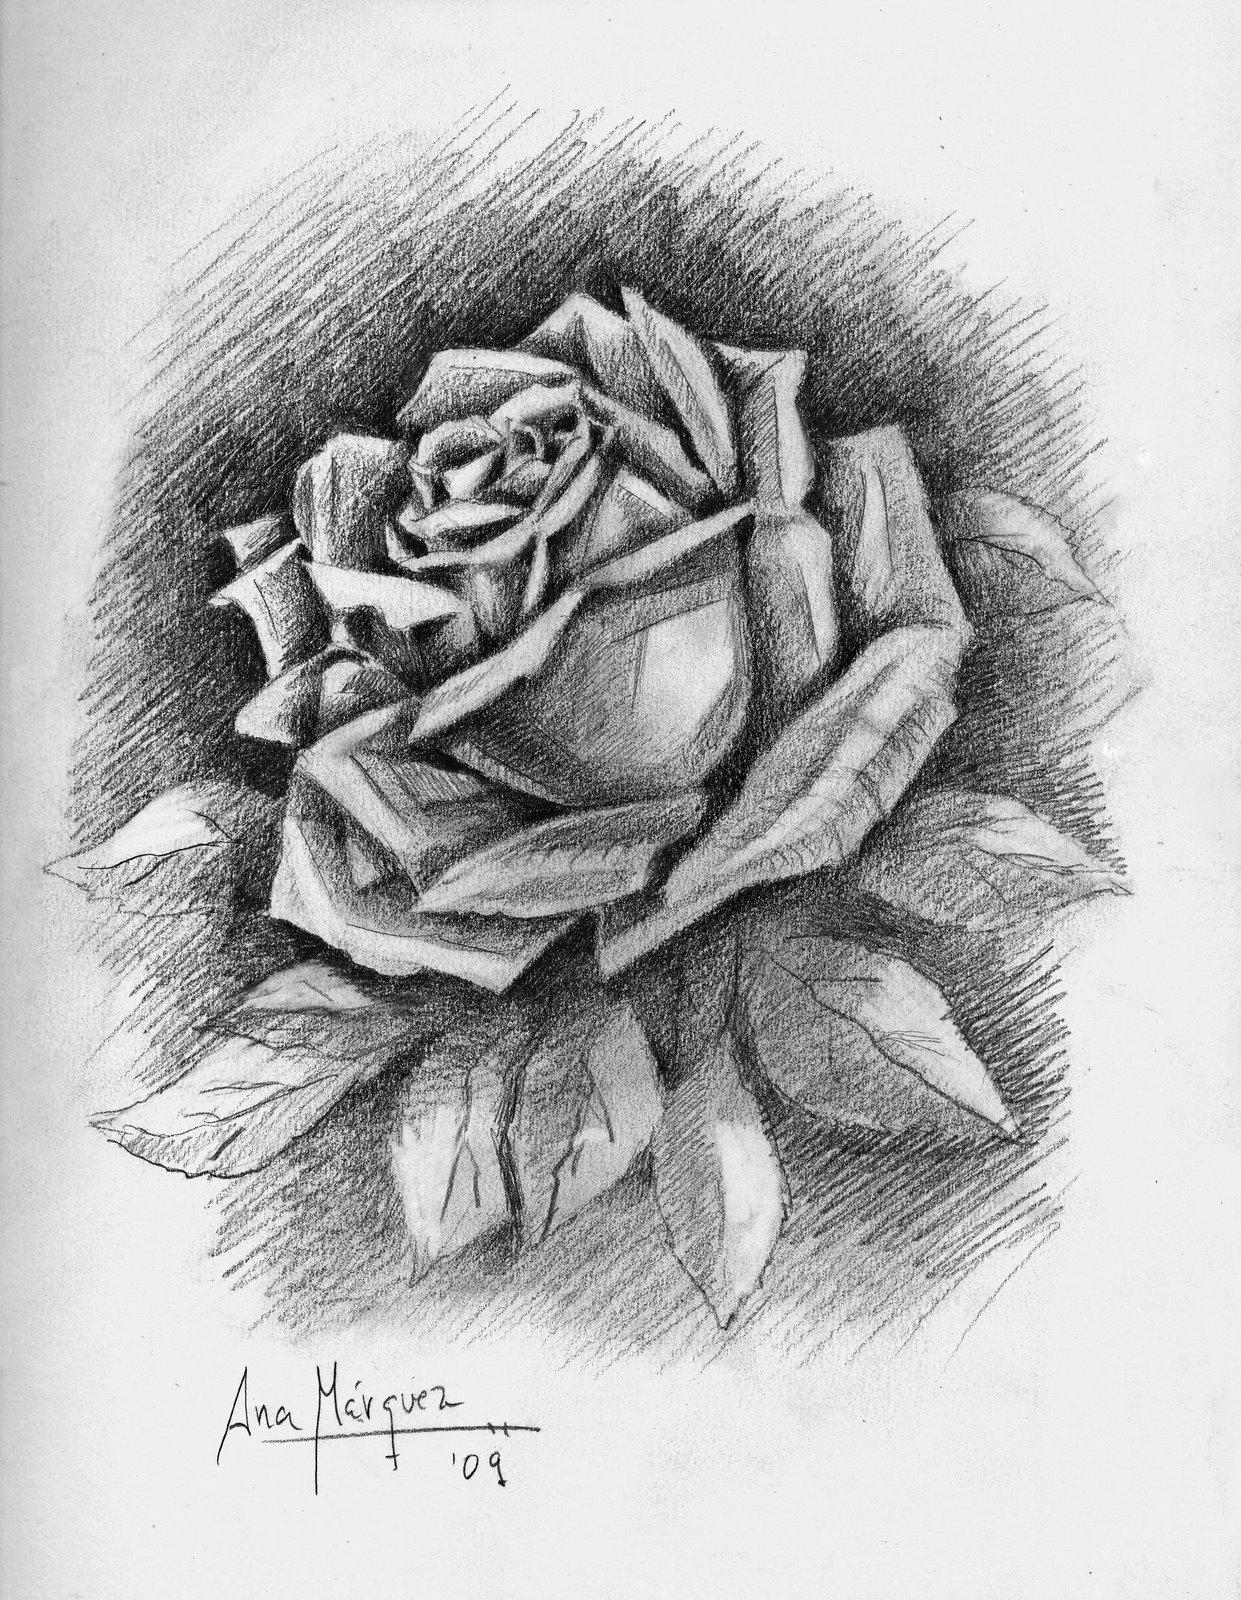 Dibujos de rosas a lapiz graphic transparent stock Dibujos de rosas a lapiz - ClipartFest graphic transparent stock